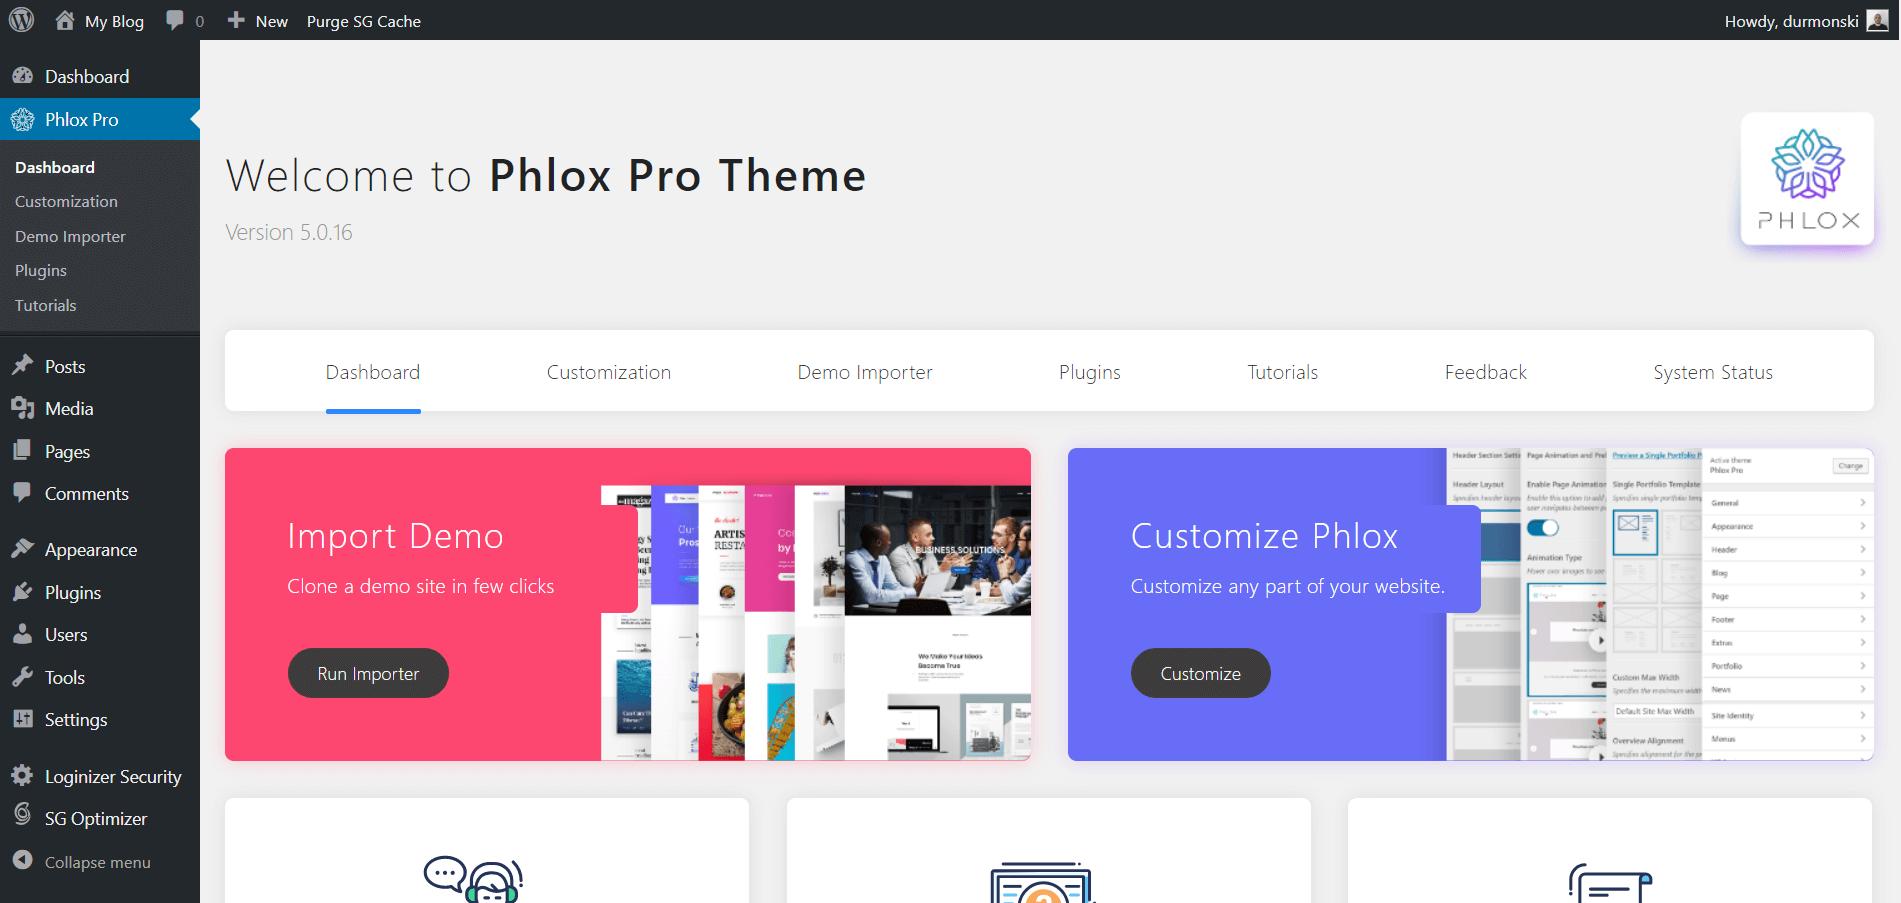 Phlox Pro Theme Installation 3